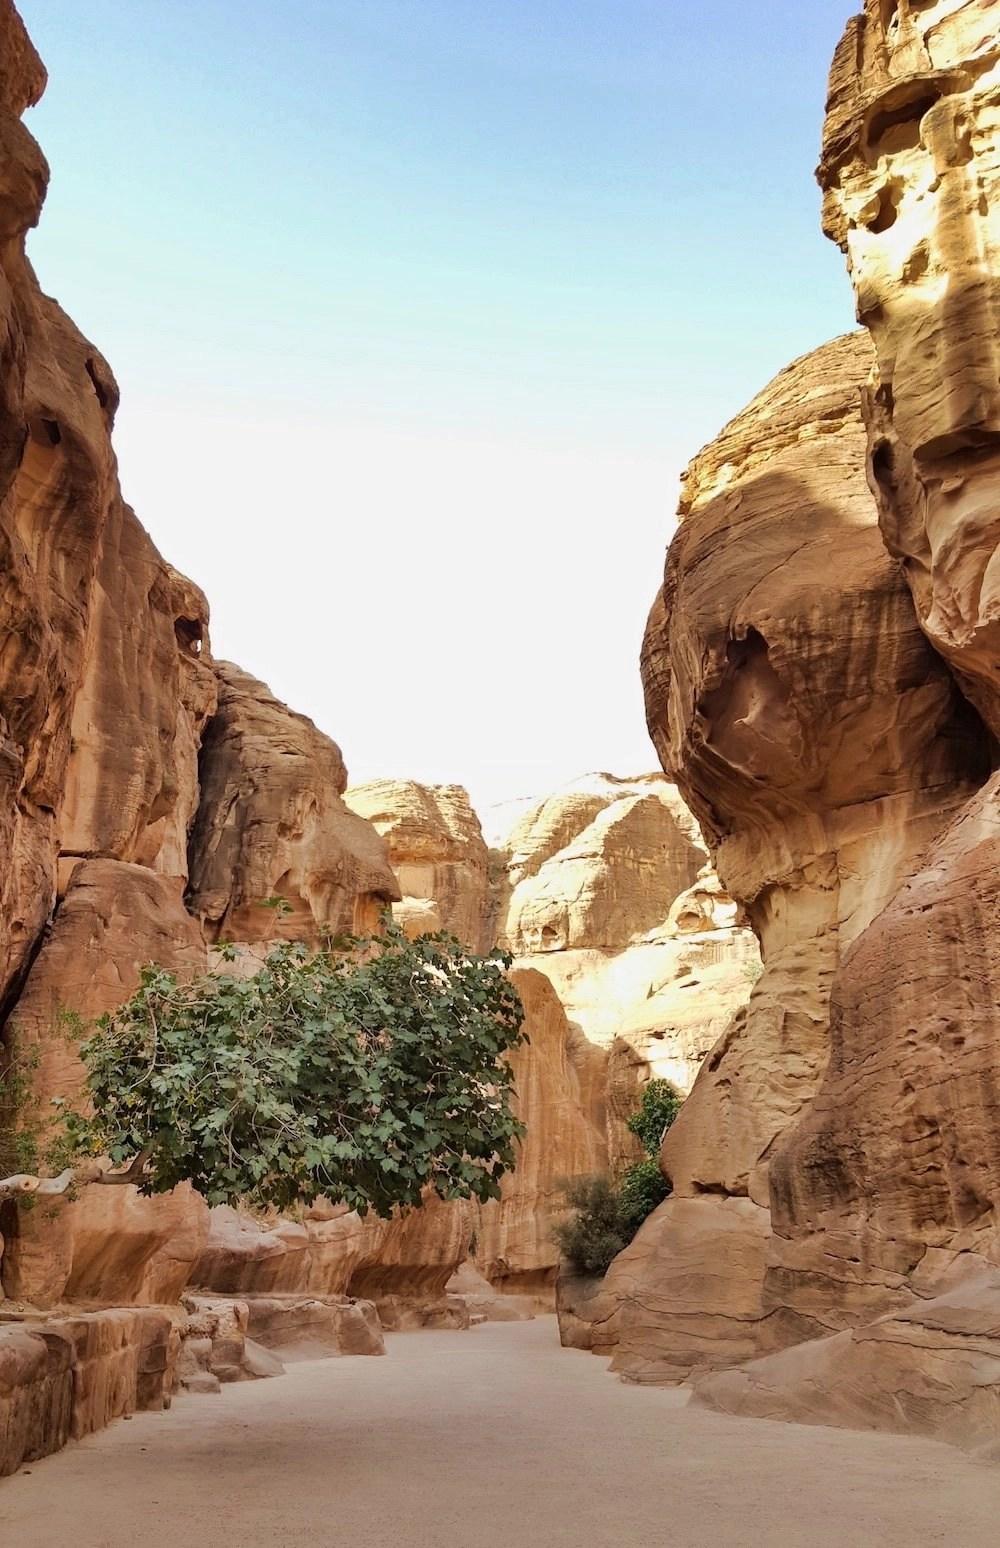 Petra Hiking - Main Trail